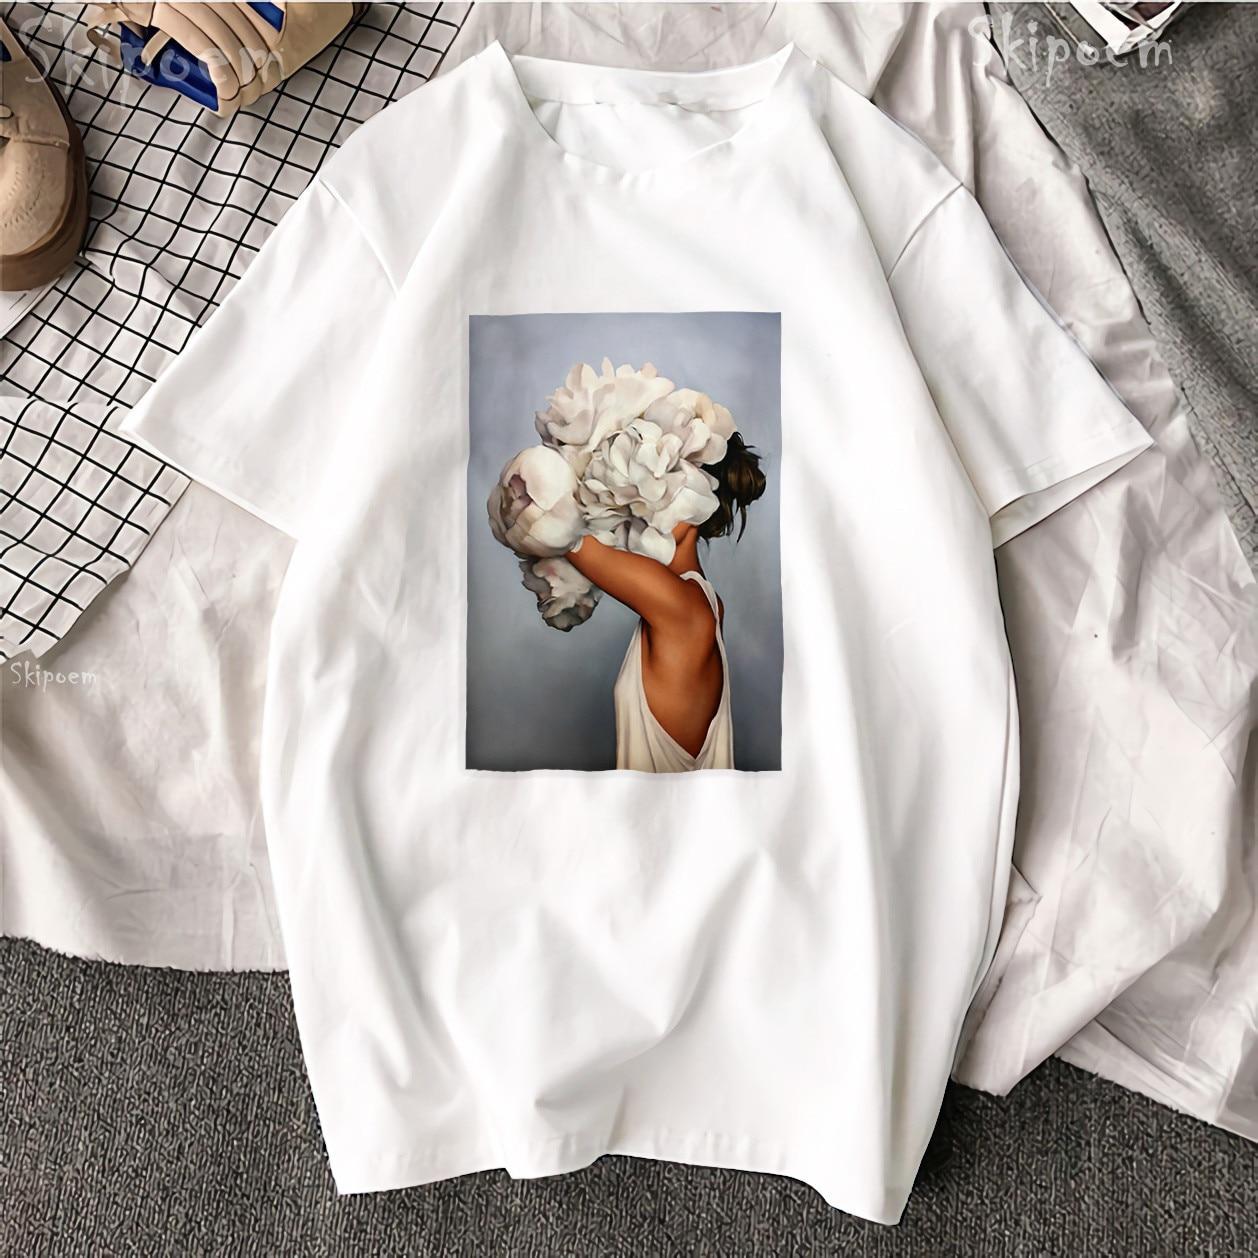 3b6a8f238 2019 New Women T-shirts Casual Harajuku Love Printed Tops Tee Summer Female T  Shirt Short Sleeve T Shirt For Women Clothing